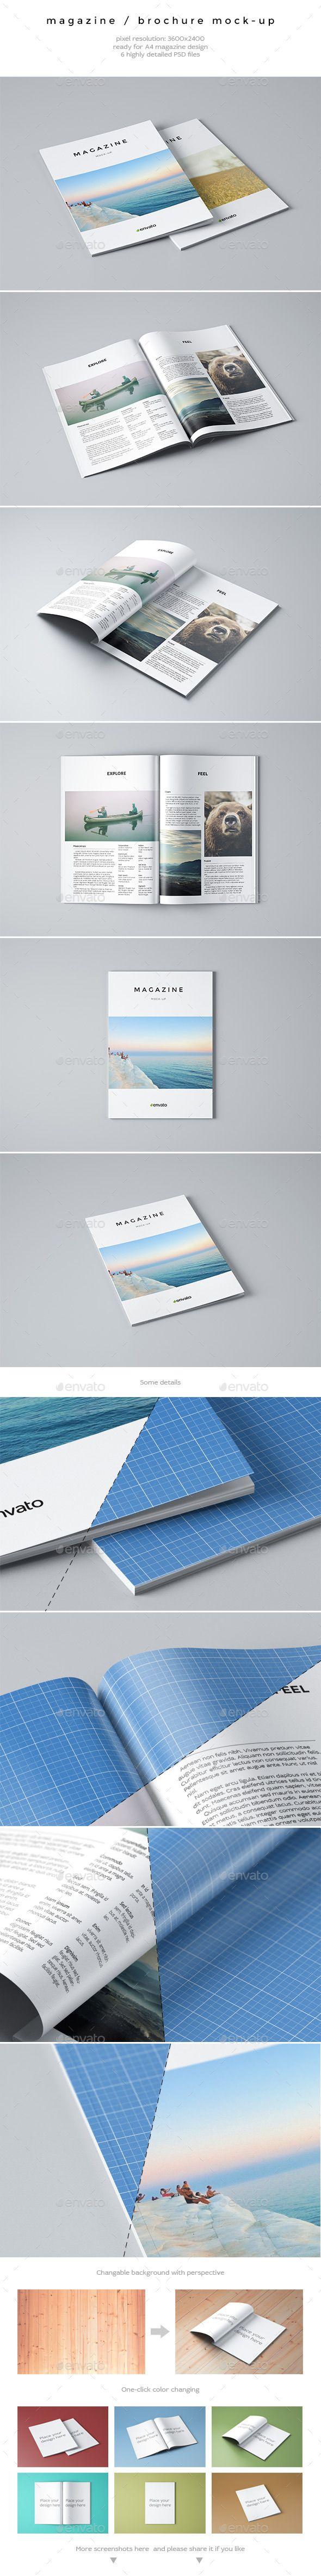 Magazine / Brochure Mock-Up | #magazinemockup #brochuremockup | Download: http://graphicriver.net/item/magazine-brochure-mockup/9445696?ref=ksioks